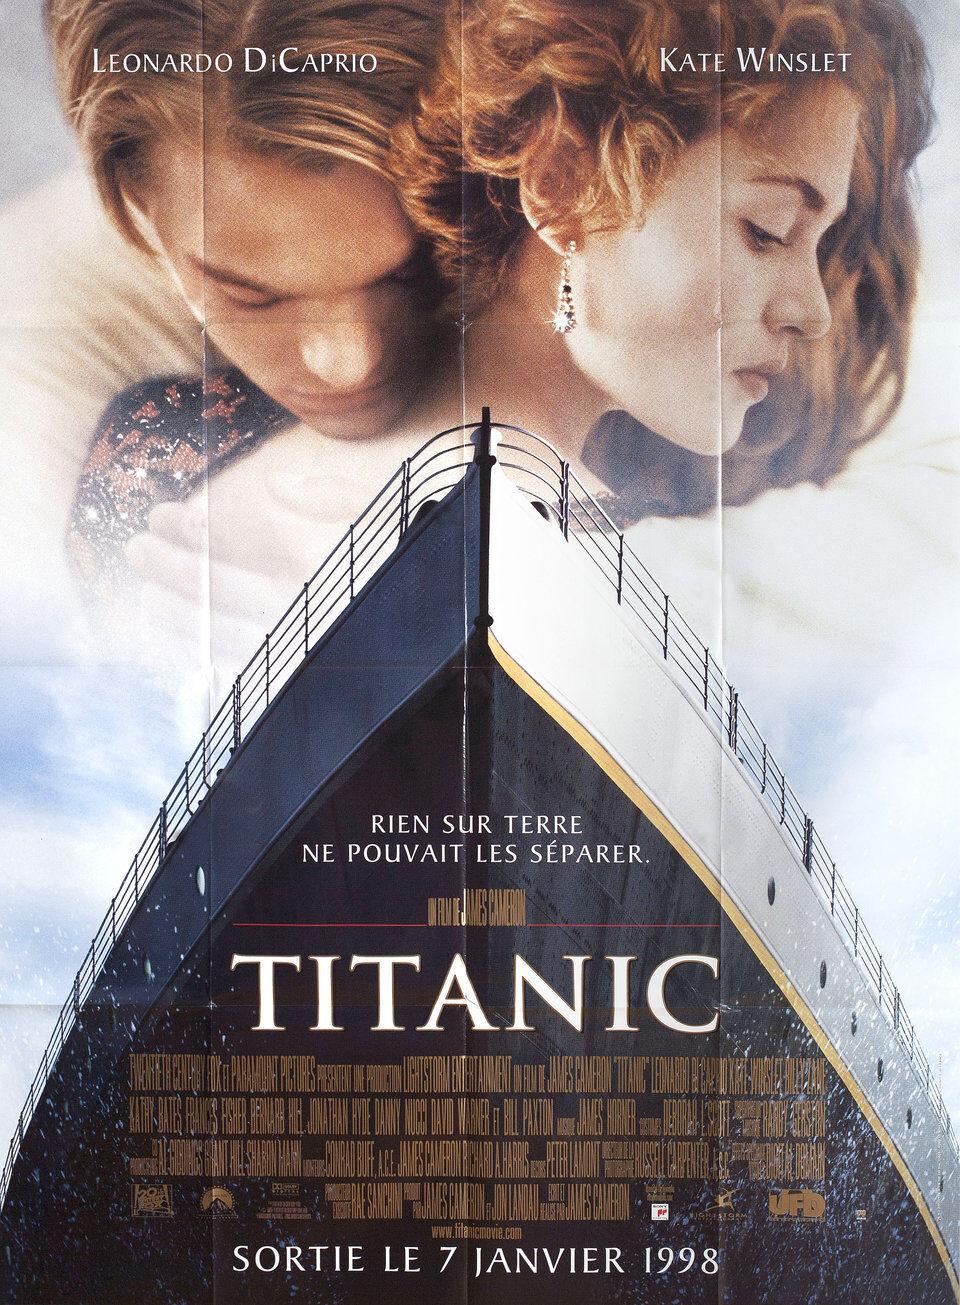 Titanic 1997 french grande poster